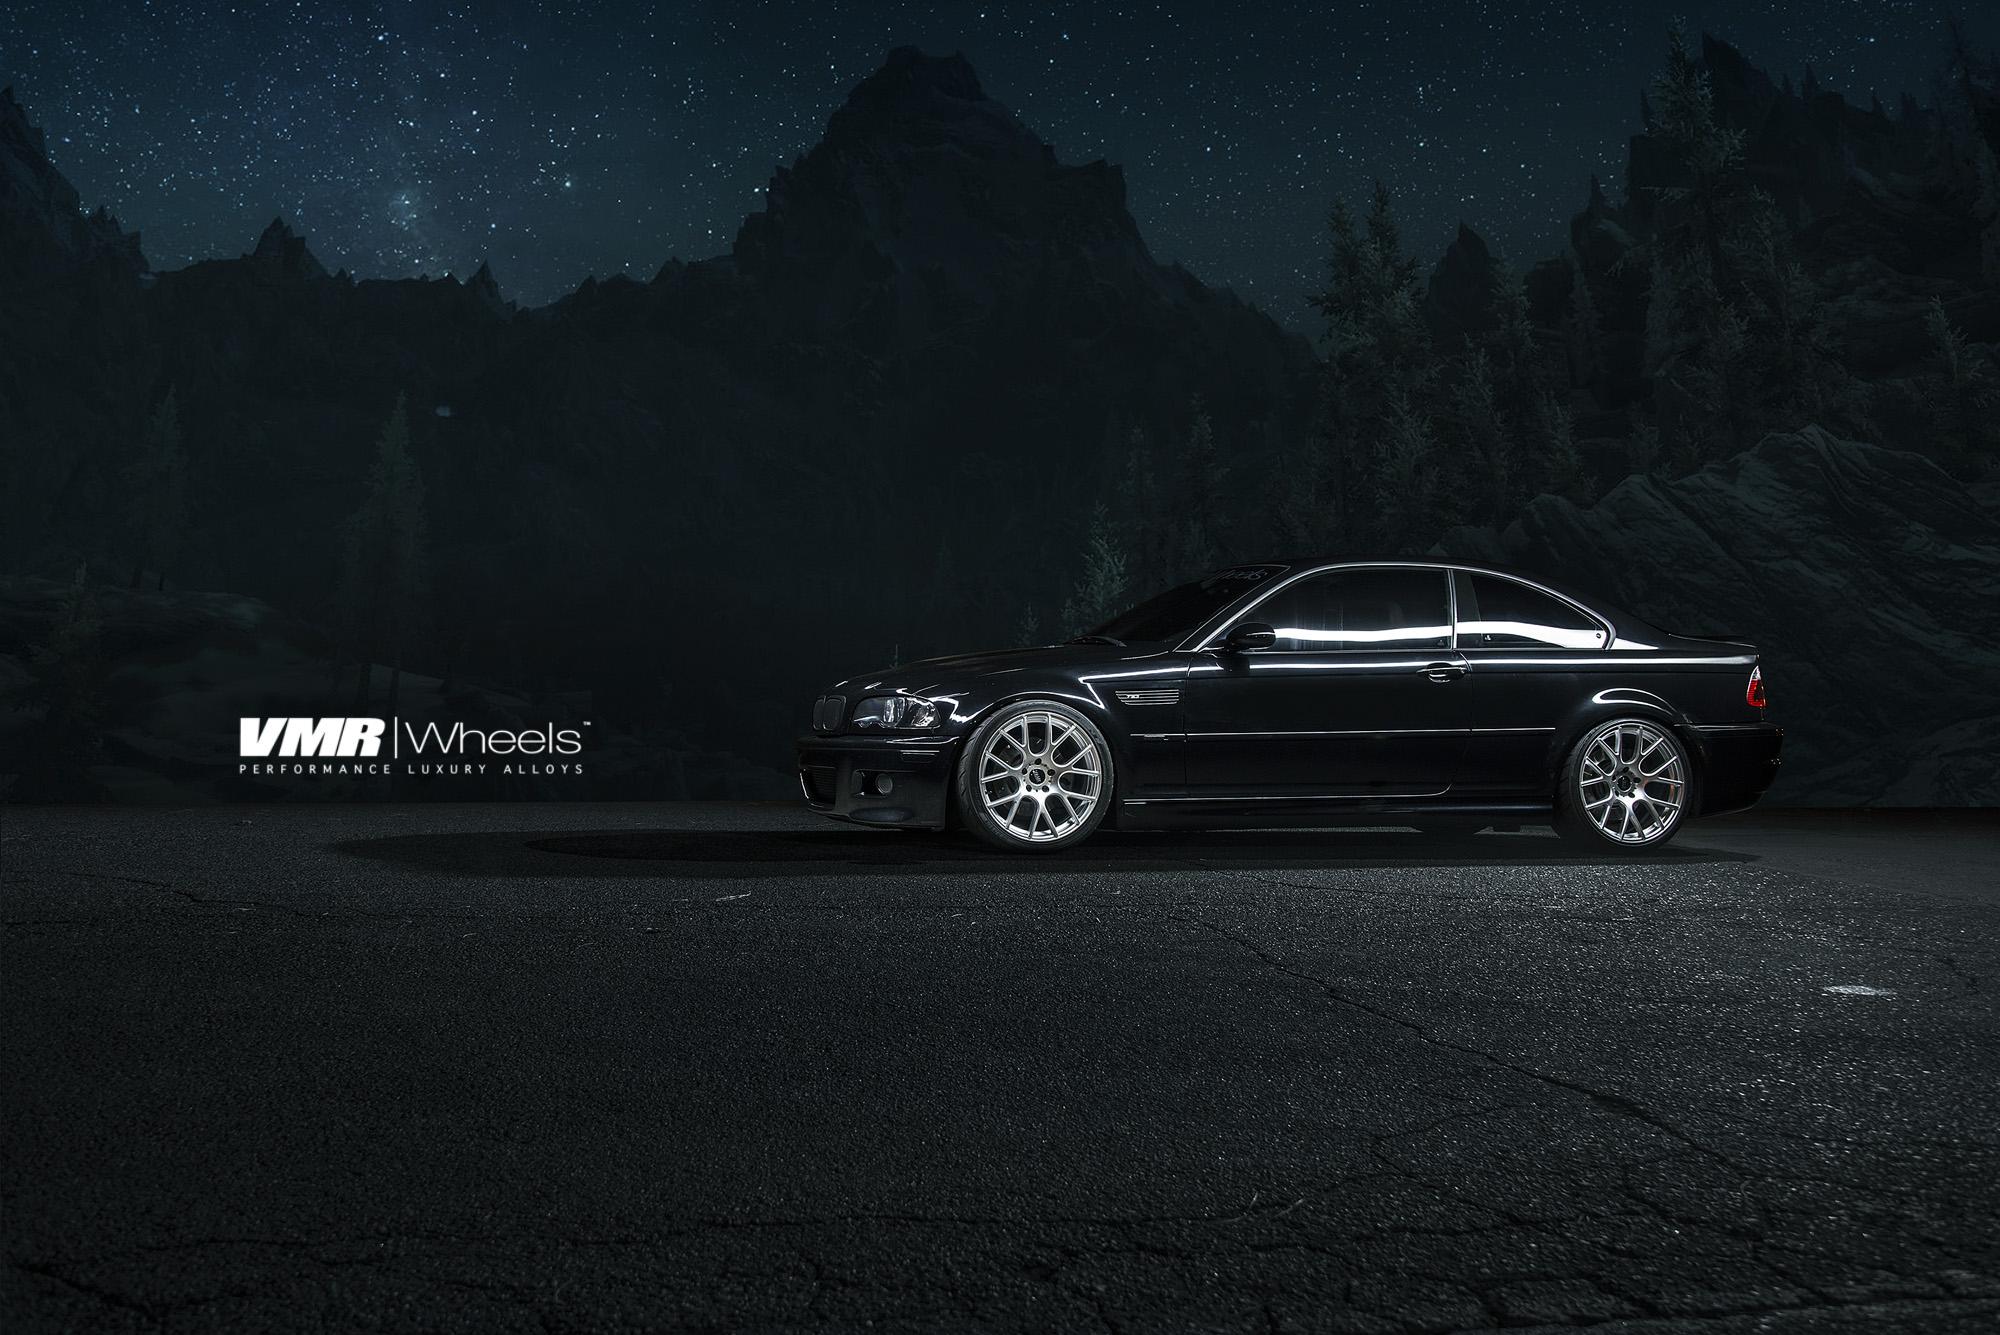 VMR V810 19in Hyper Silver Wheels on BMW E46 M3